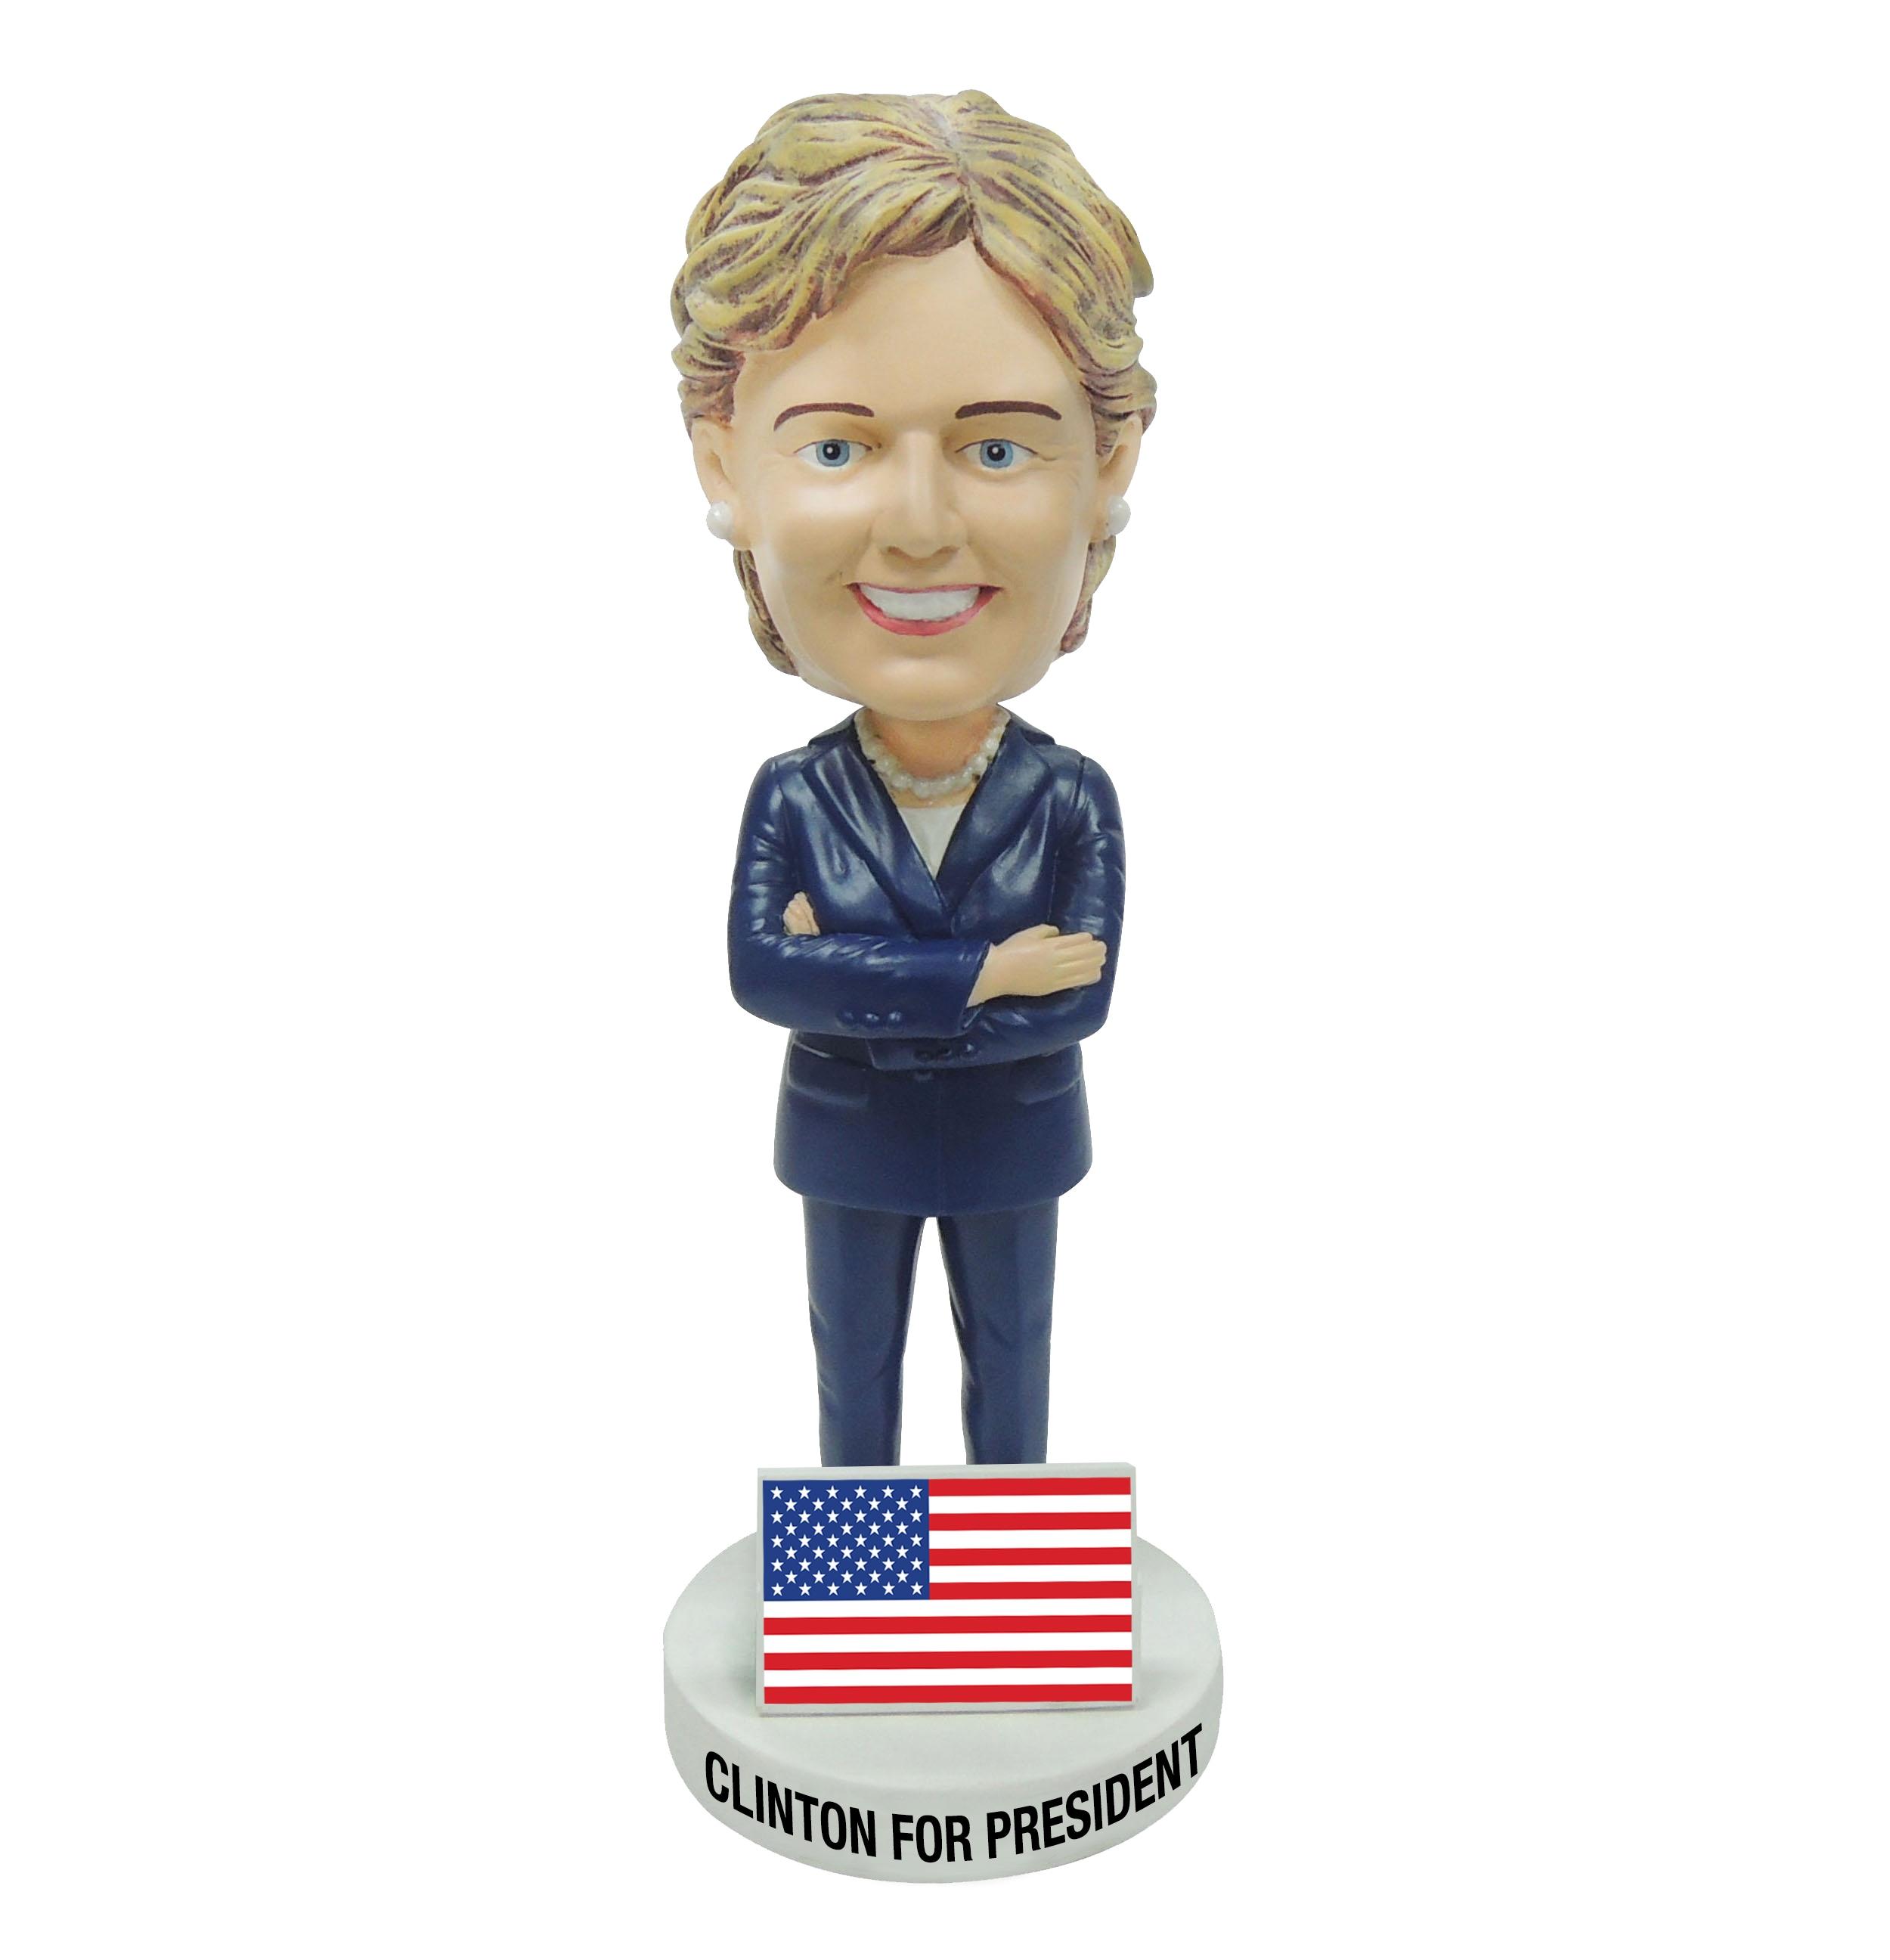 Hillary Clinton For President Bobblehead